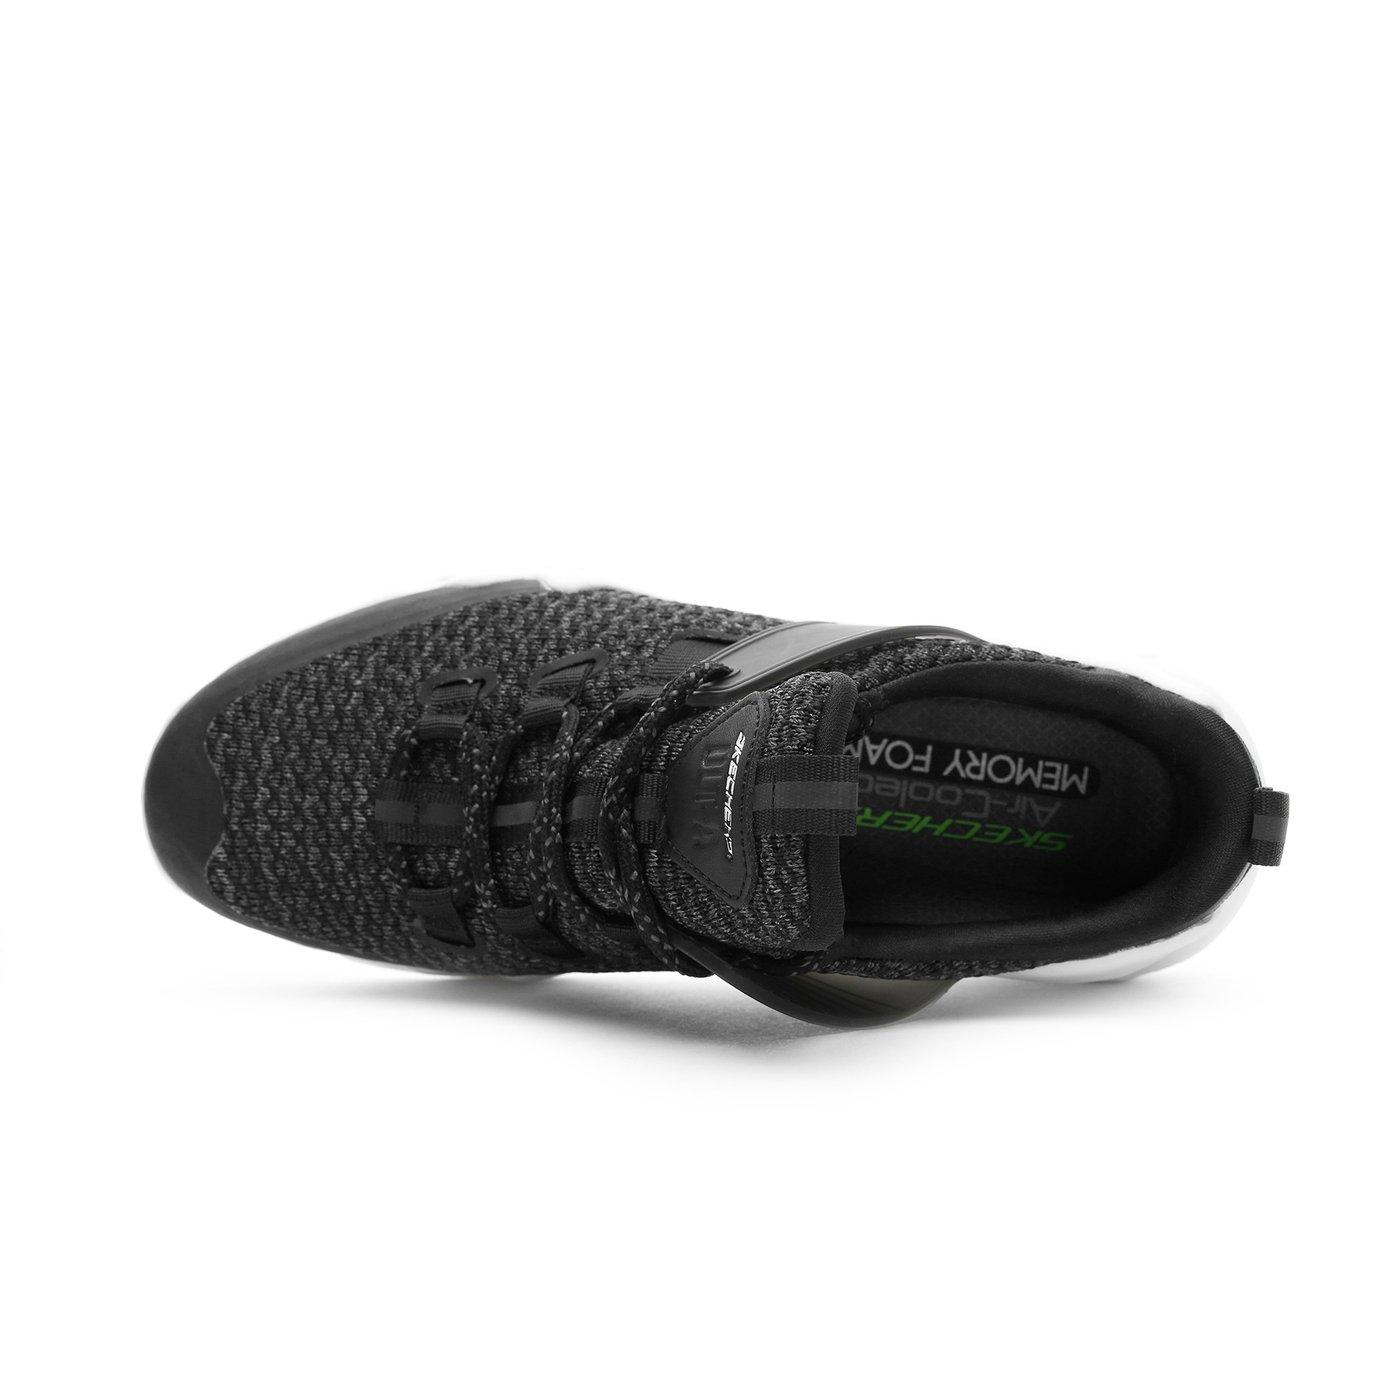 Skechers DLT-A Siyah Erkek Spor Ayakkabı